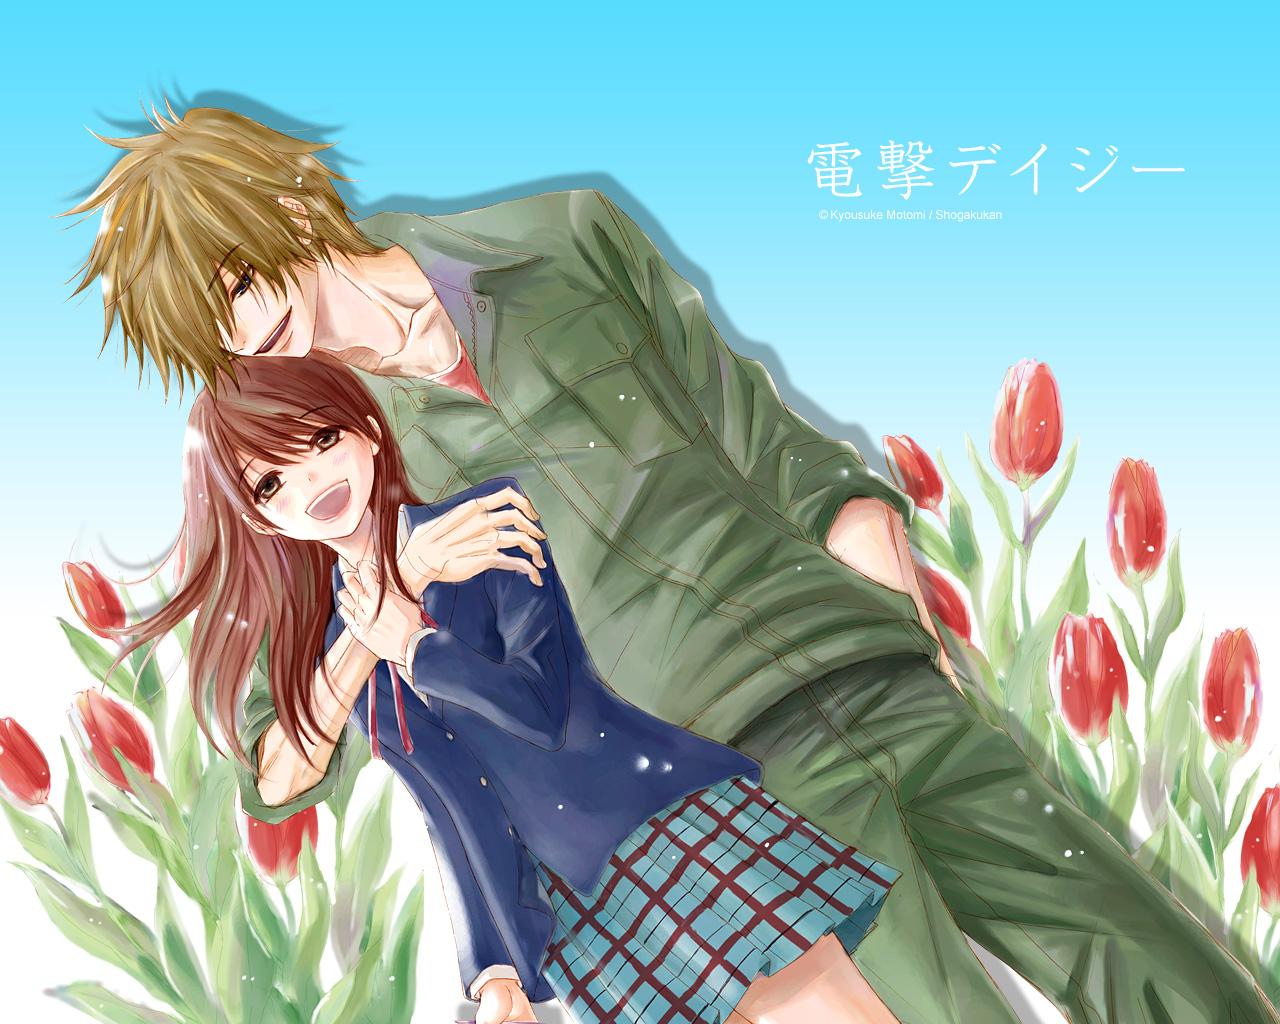 Dengeki Daisy Pics, Anime Collection